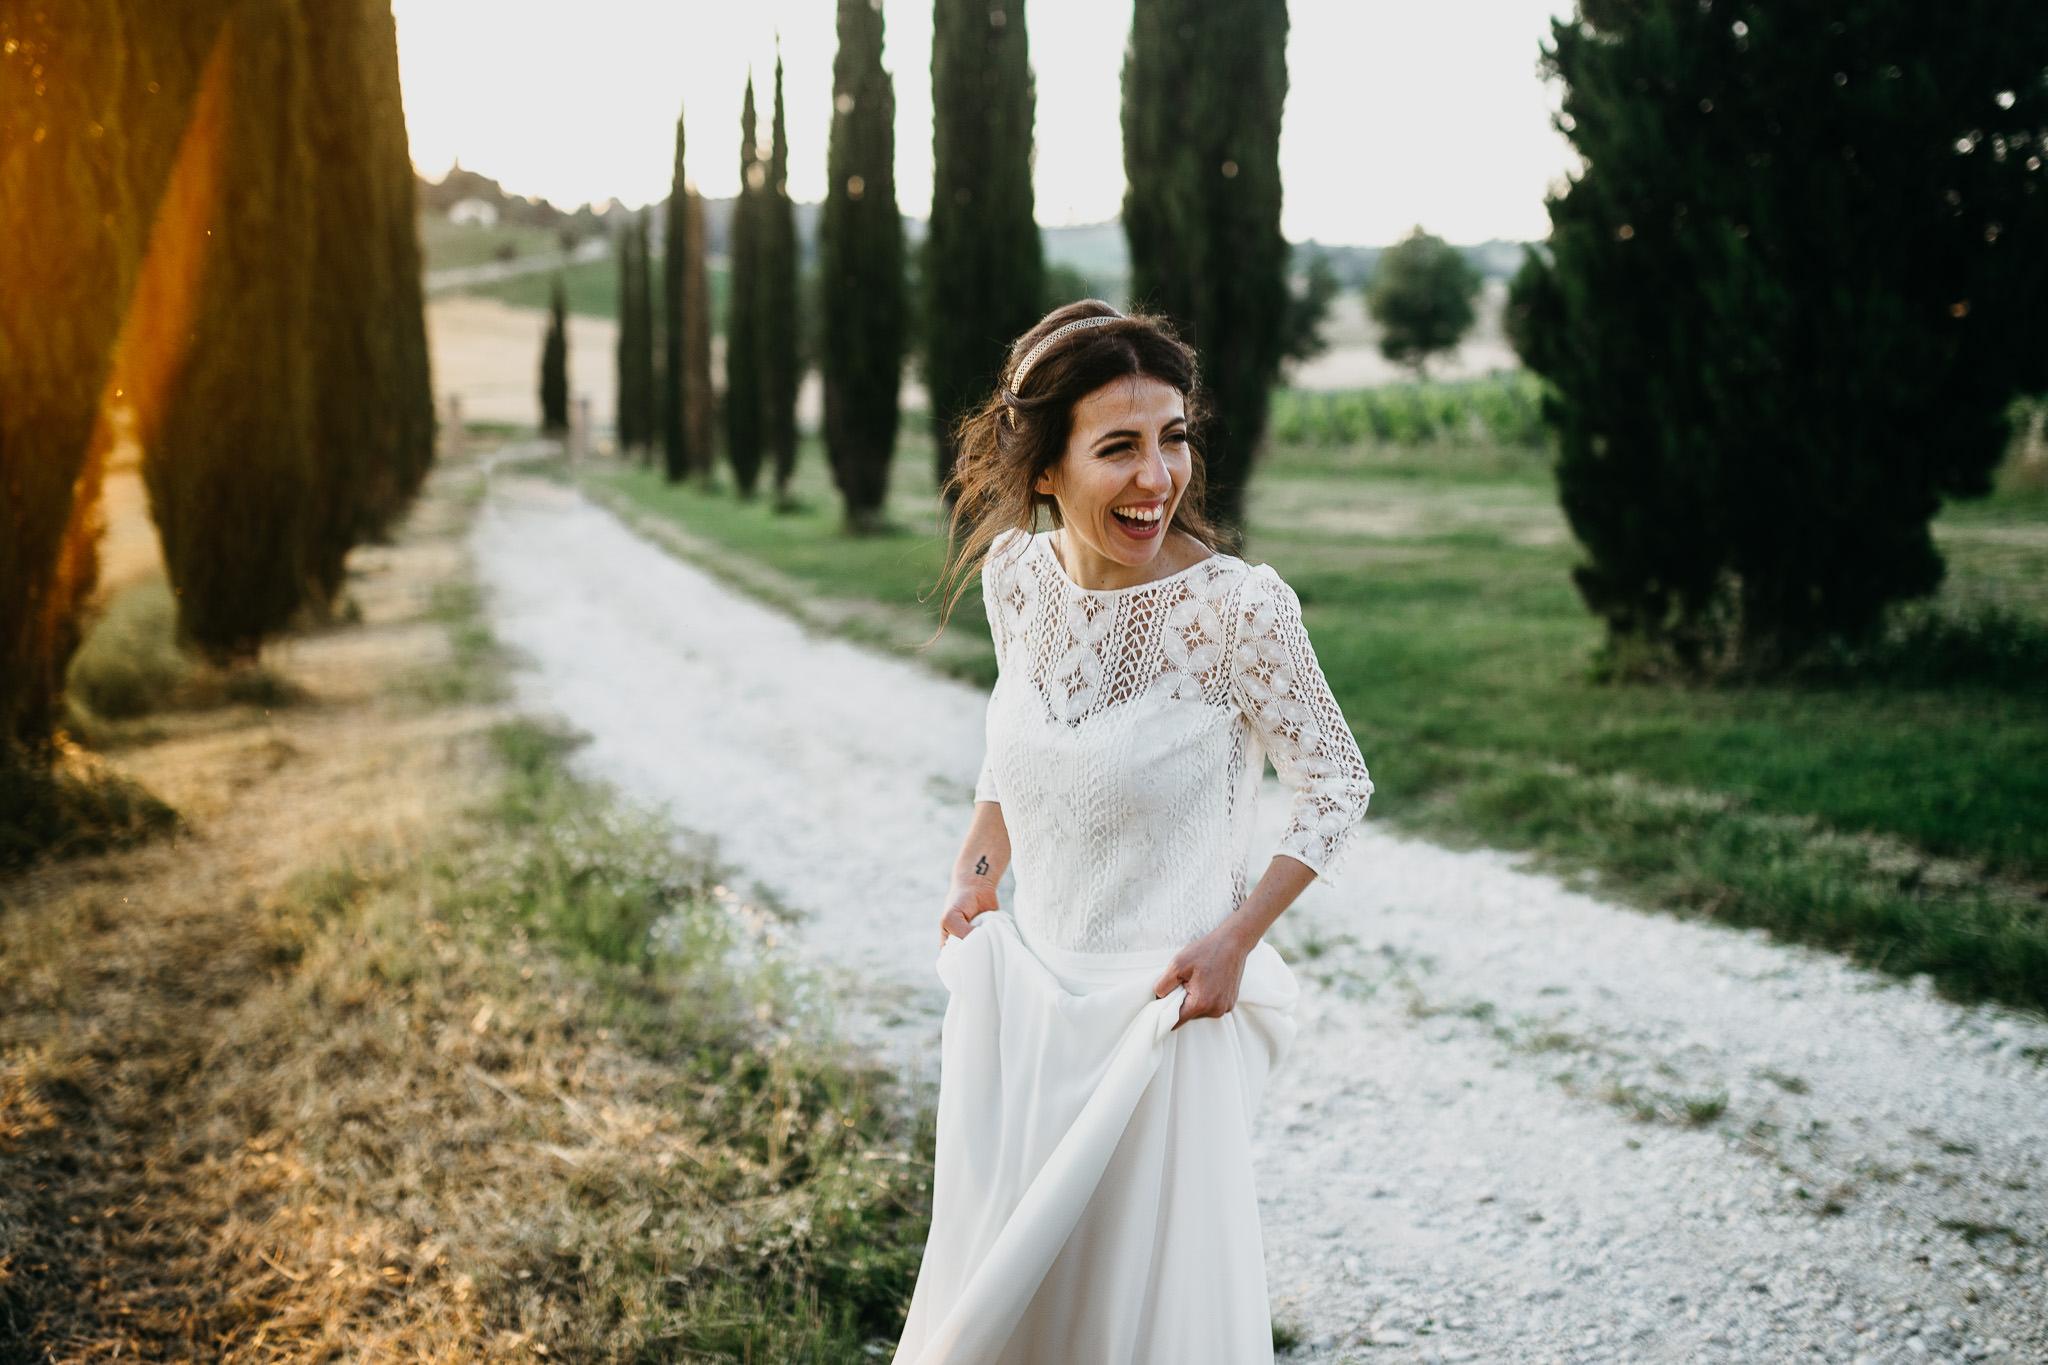 sunset destination wedding in tuscany italy